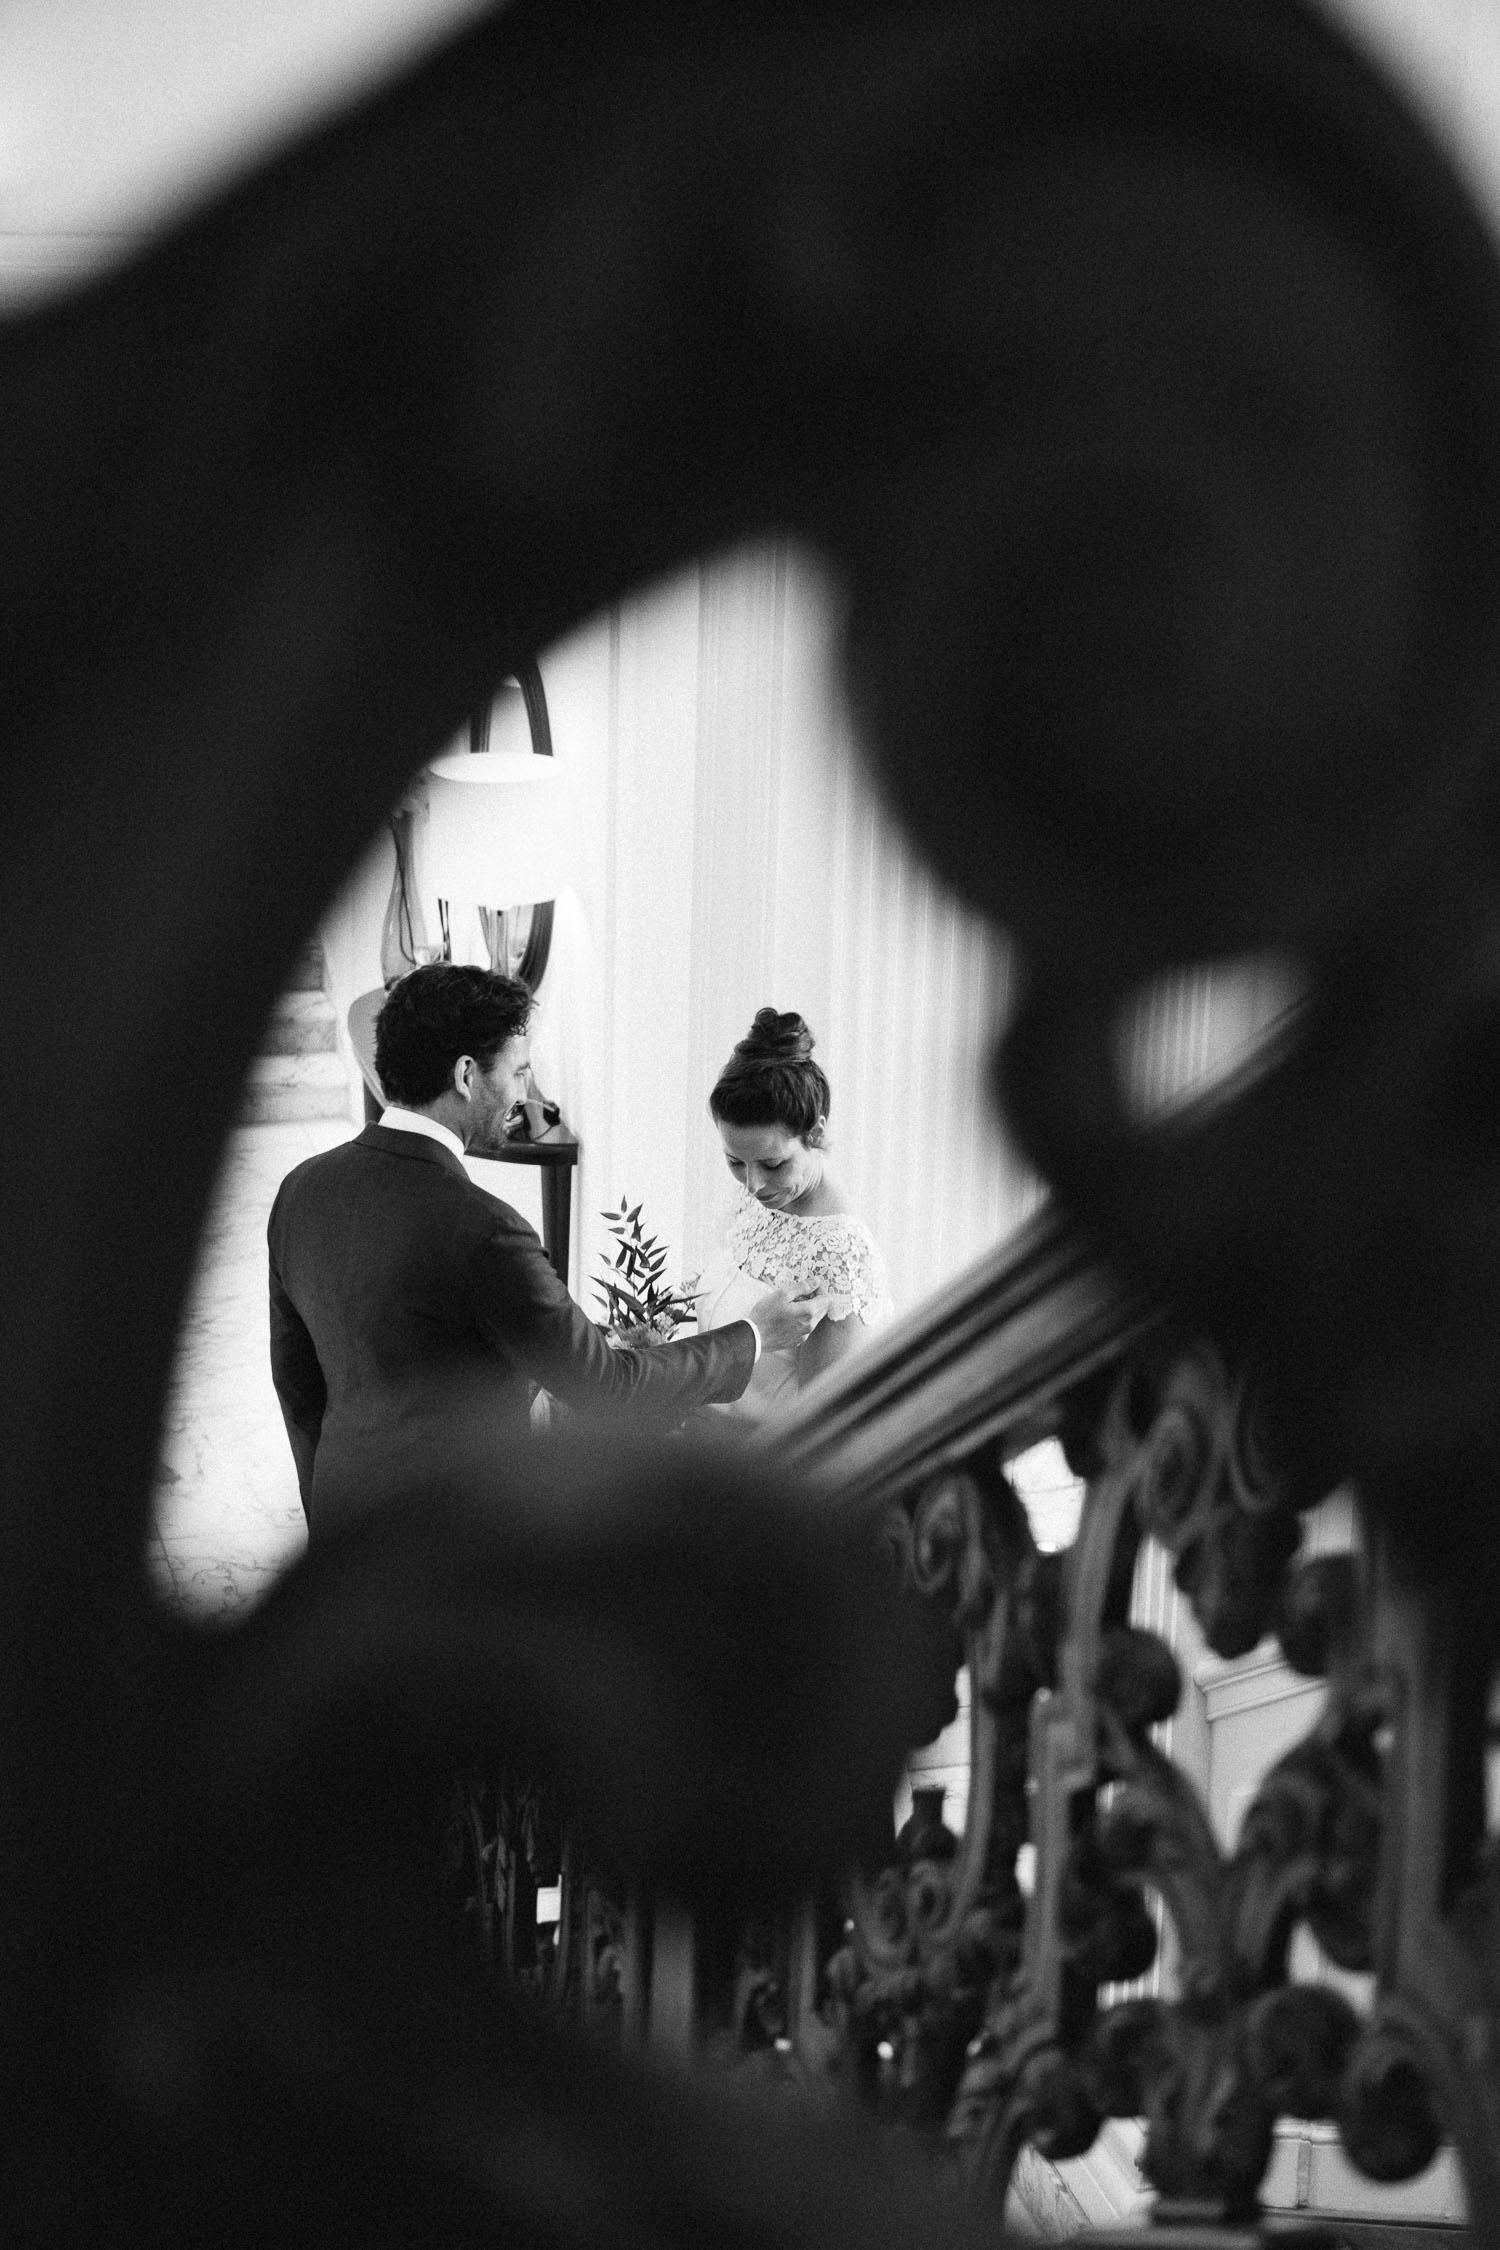 Backyard-wedding-Bruiloft-Annemiek-David-fotografie-photography-On-a-hazy-morning-Amsterdam-The-Netherlands078.jpg